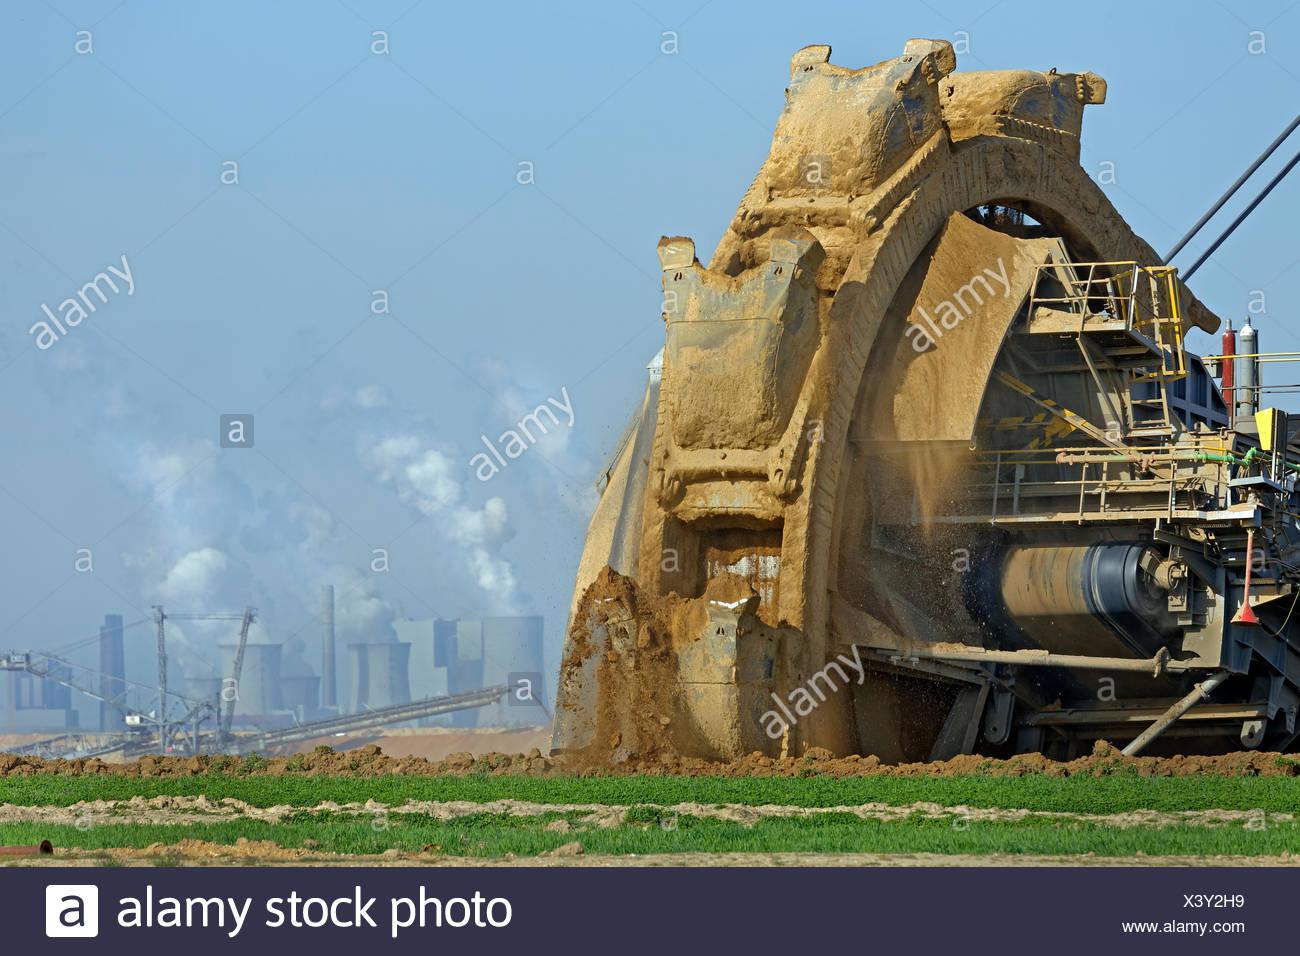 Bucket wheel excavator, lignite opencast mine Garzweiler, North Rhine-Westphalia, Germany Stock Photo